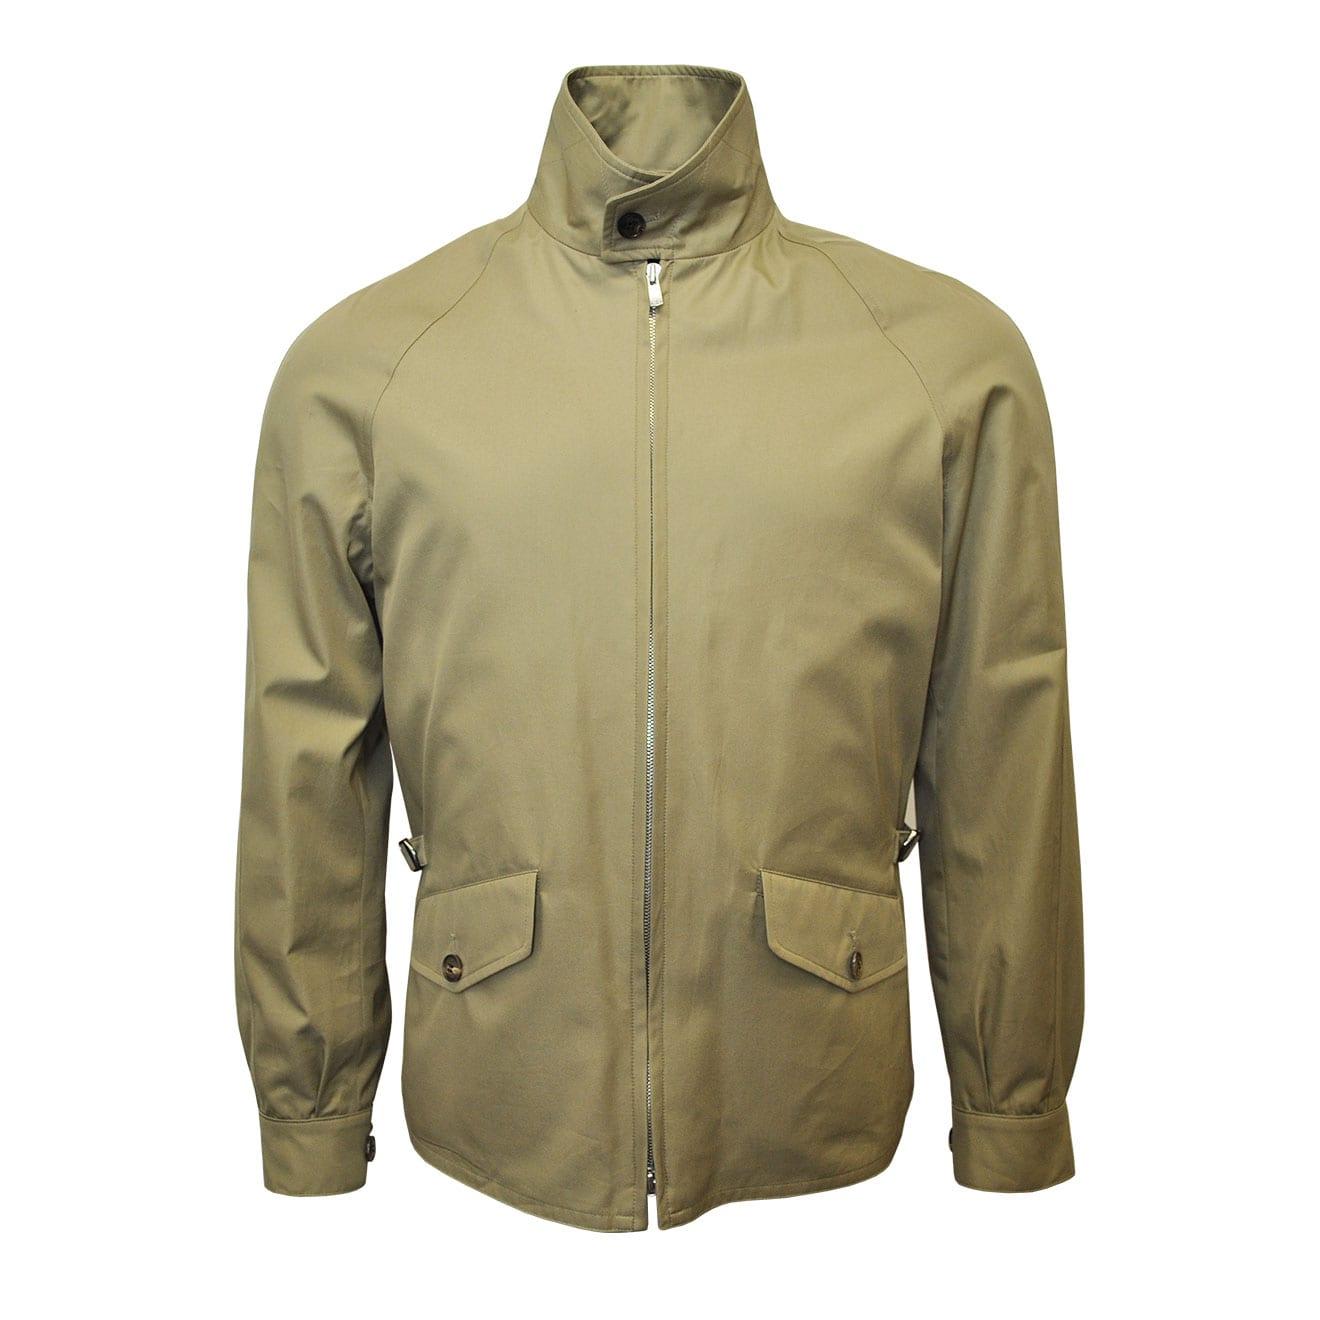 Grenfell Cloth Golfer Jacket Beige